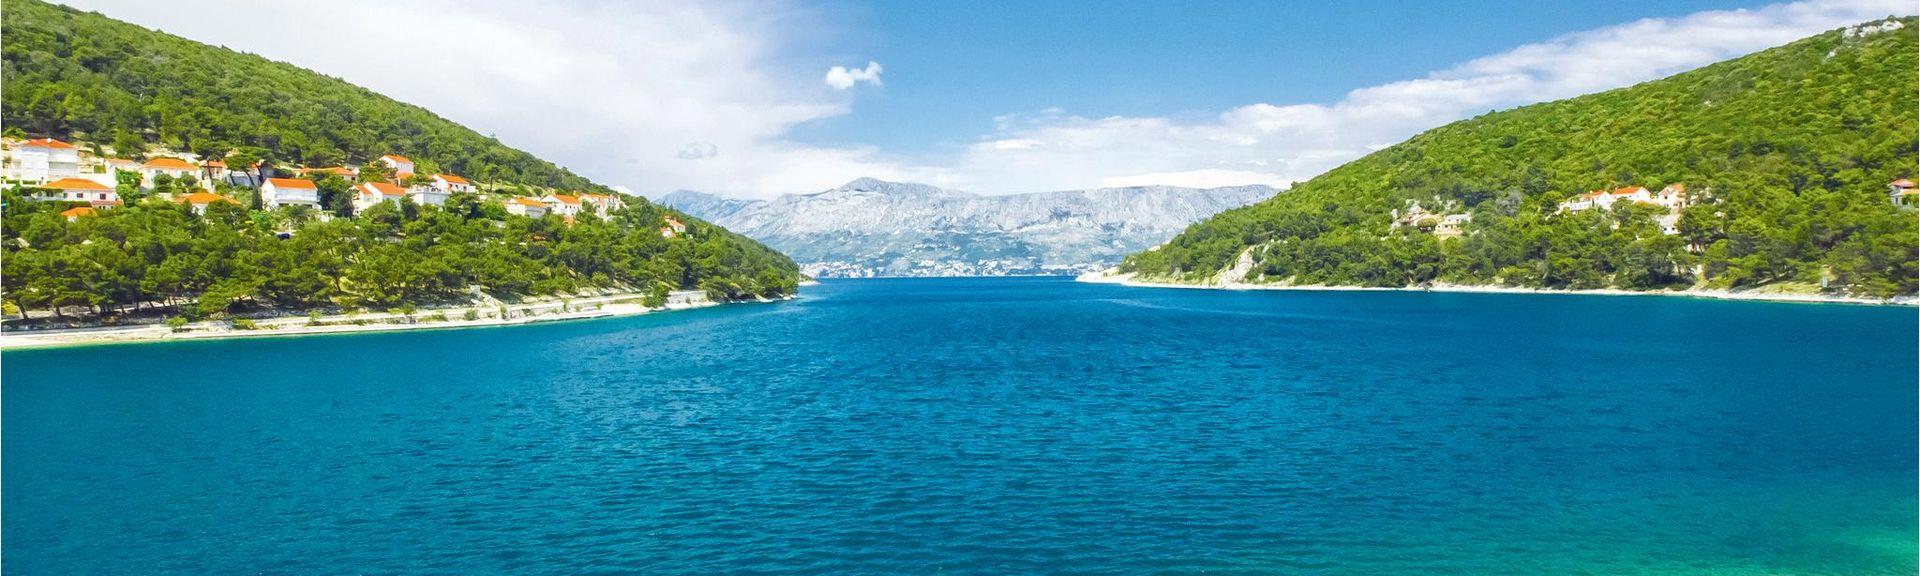 Podgora strand, Podgora, Split-Dalmatia, Kroatia